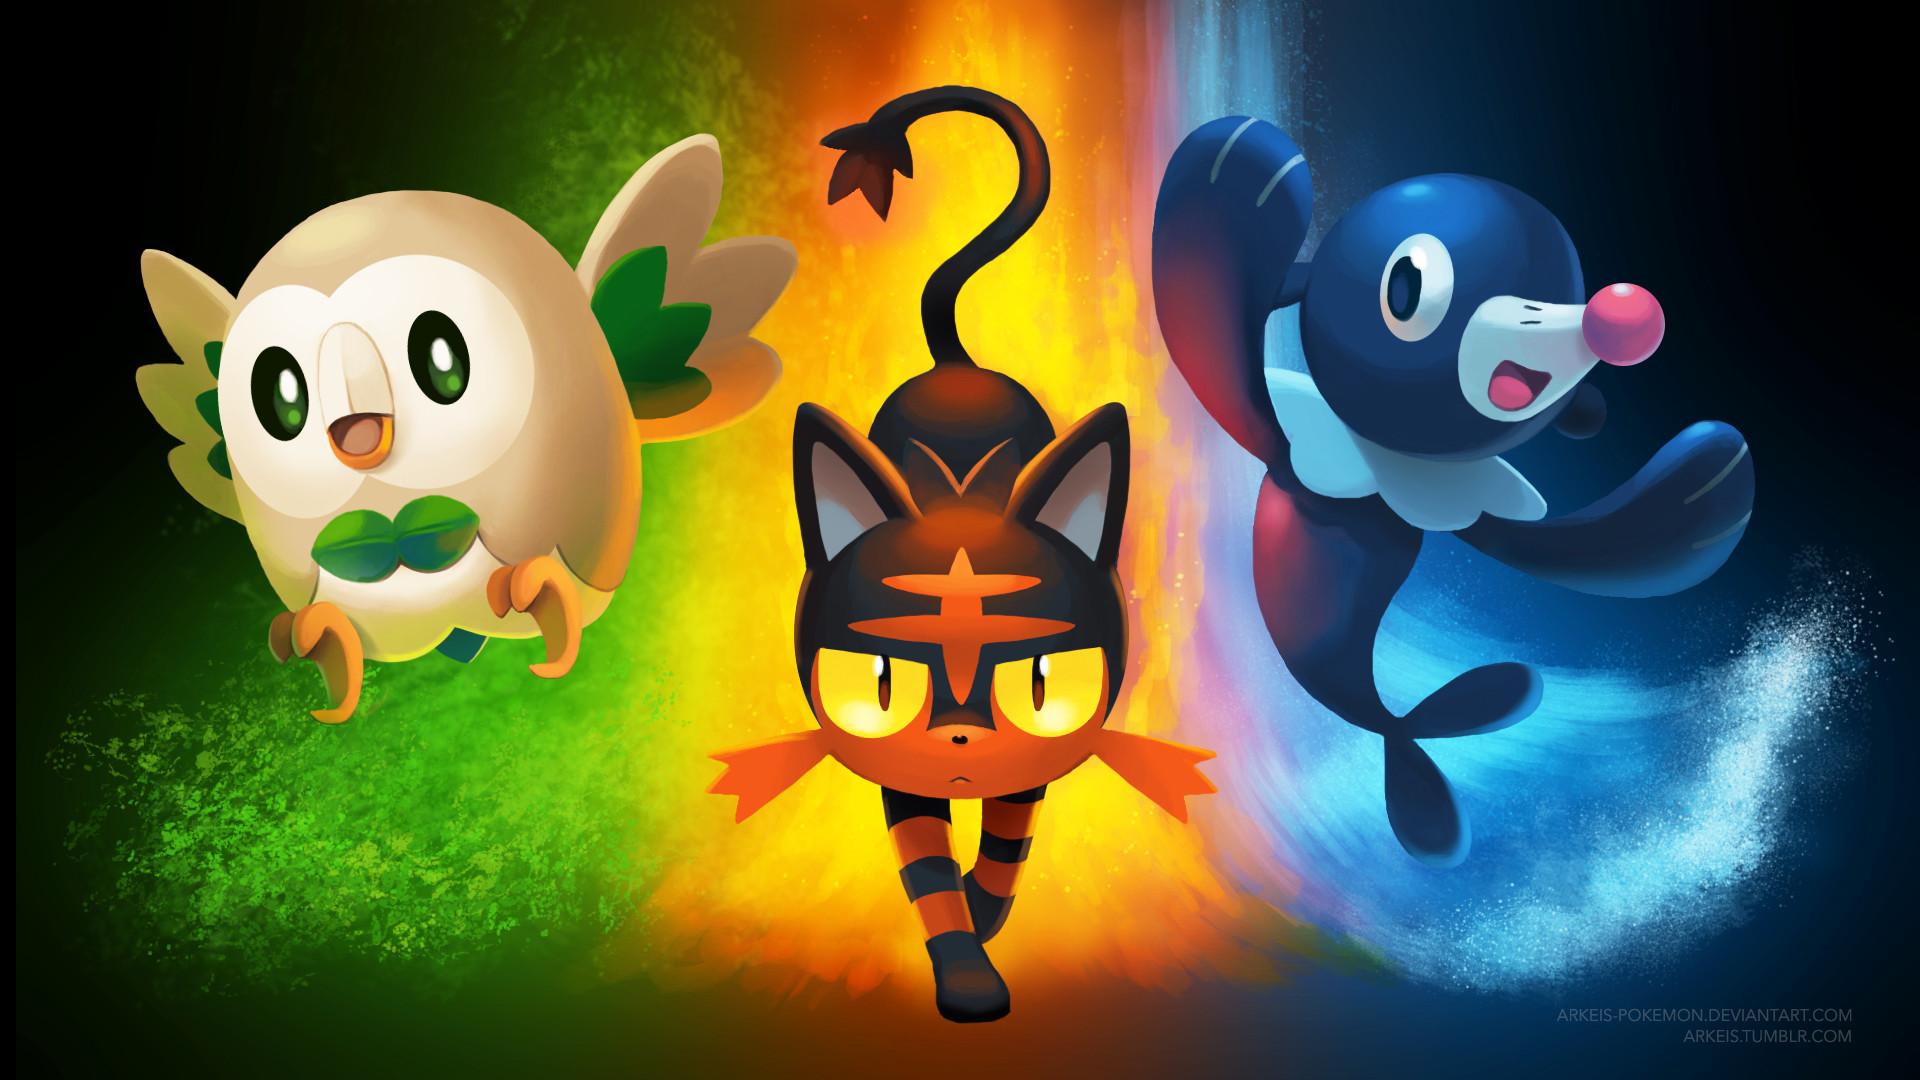 … [Wallpaper] Pokemon Sun/Moon Starters by arkeis-pokemon